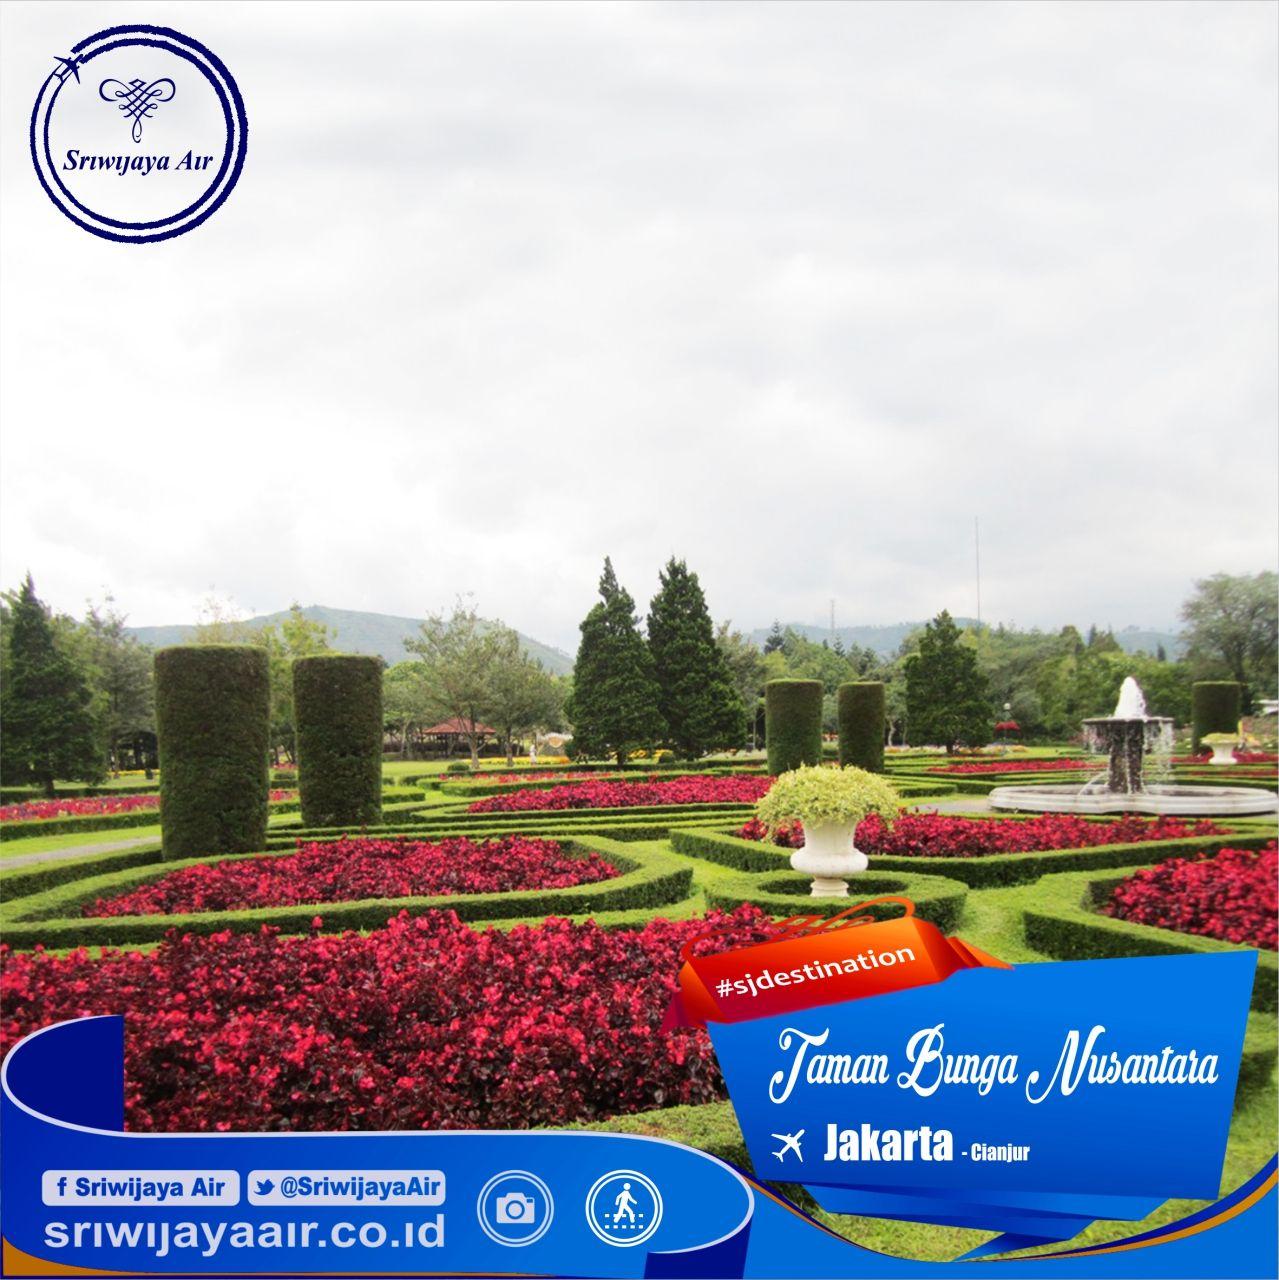 Tahukah Anda Di Puncak Terdapat Taman Bunga Yang Sangat Indah Sekali Dinamakan Taman Bunga Nusantara Diperkirakan Terdapat Sekitar 2 Taman Bunga Taman Bunga